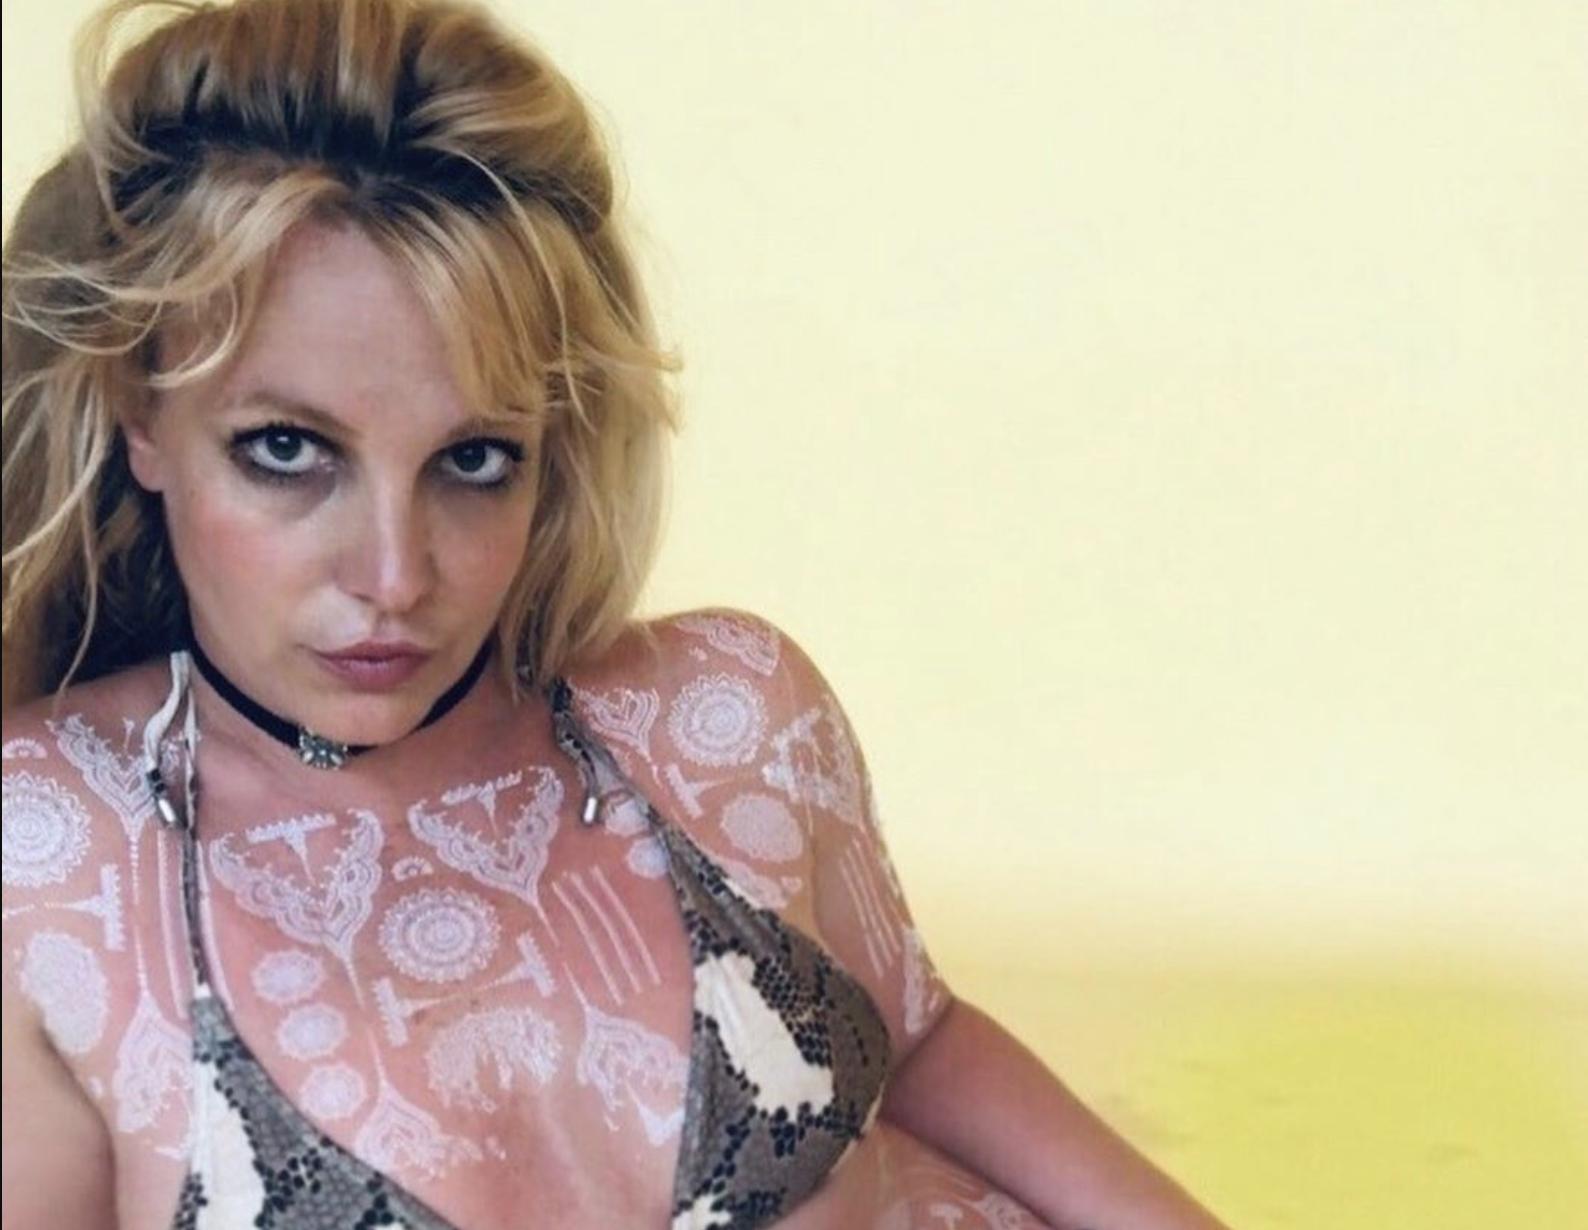 Britney Spears Showcases Full Body Henna Tattoos